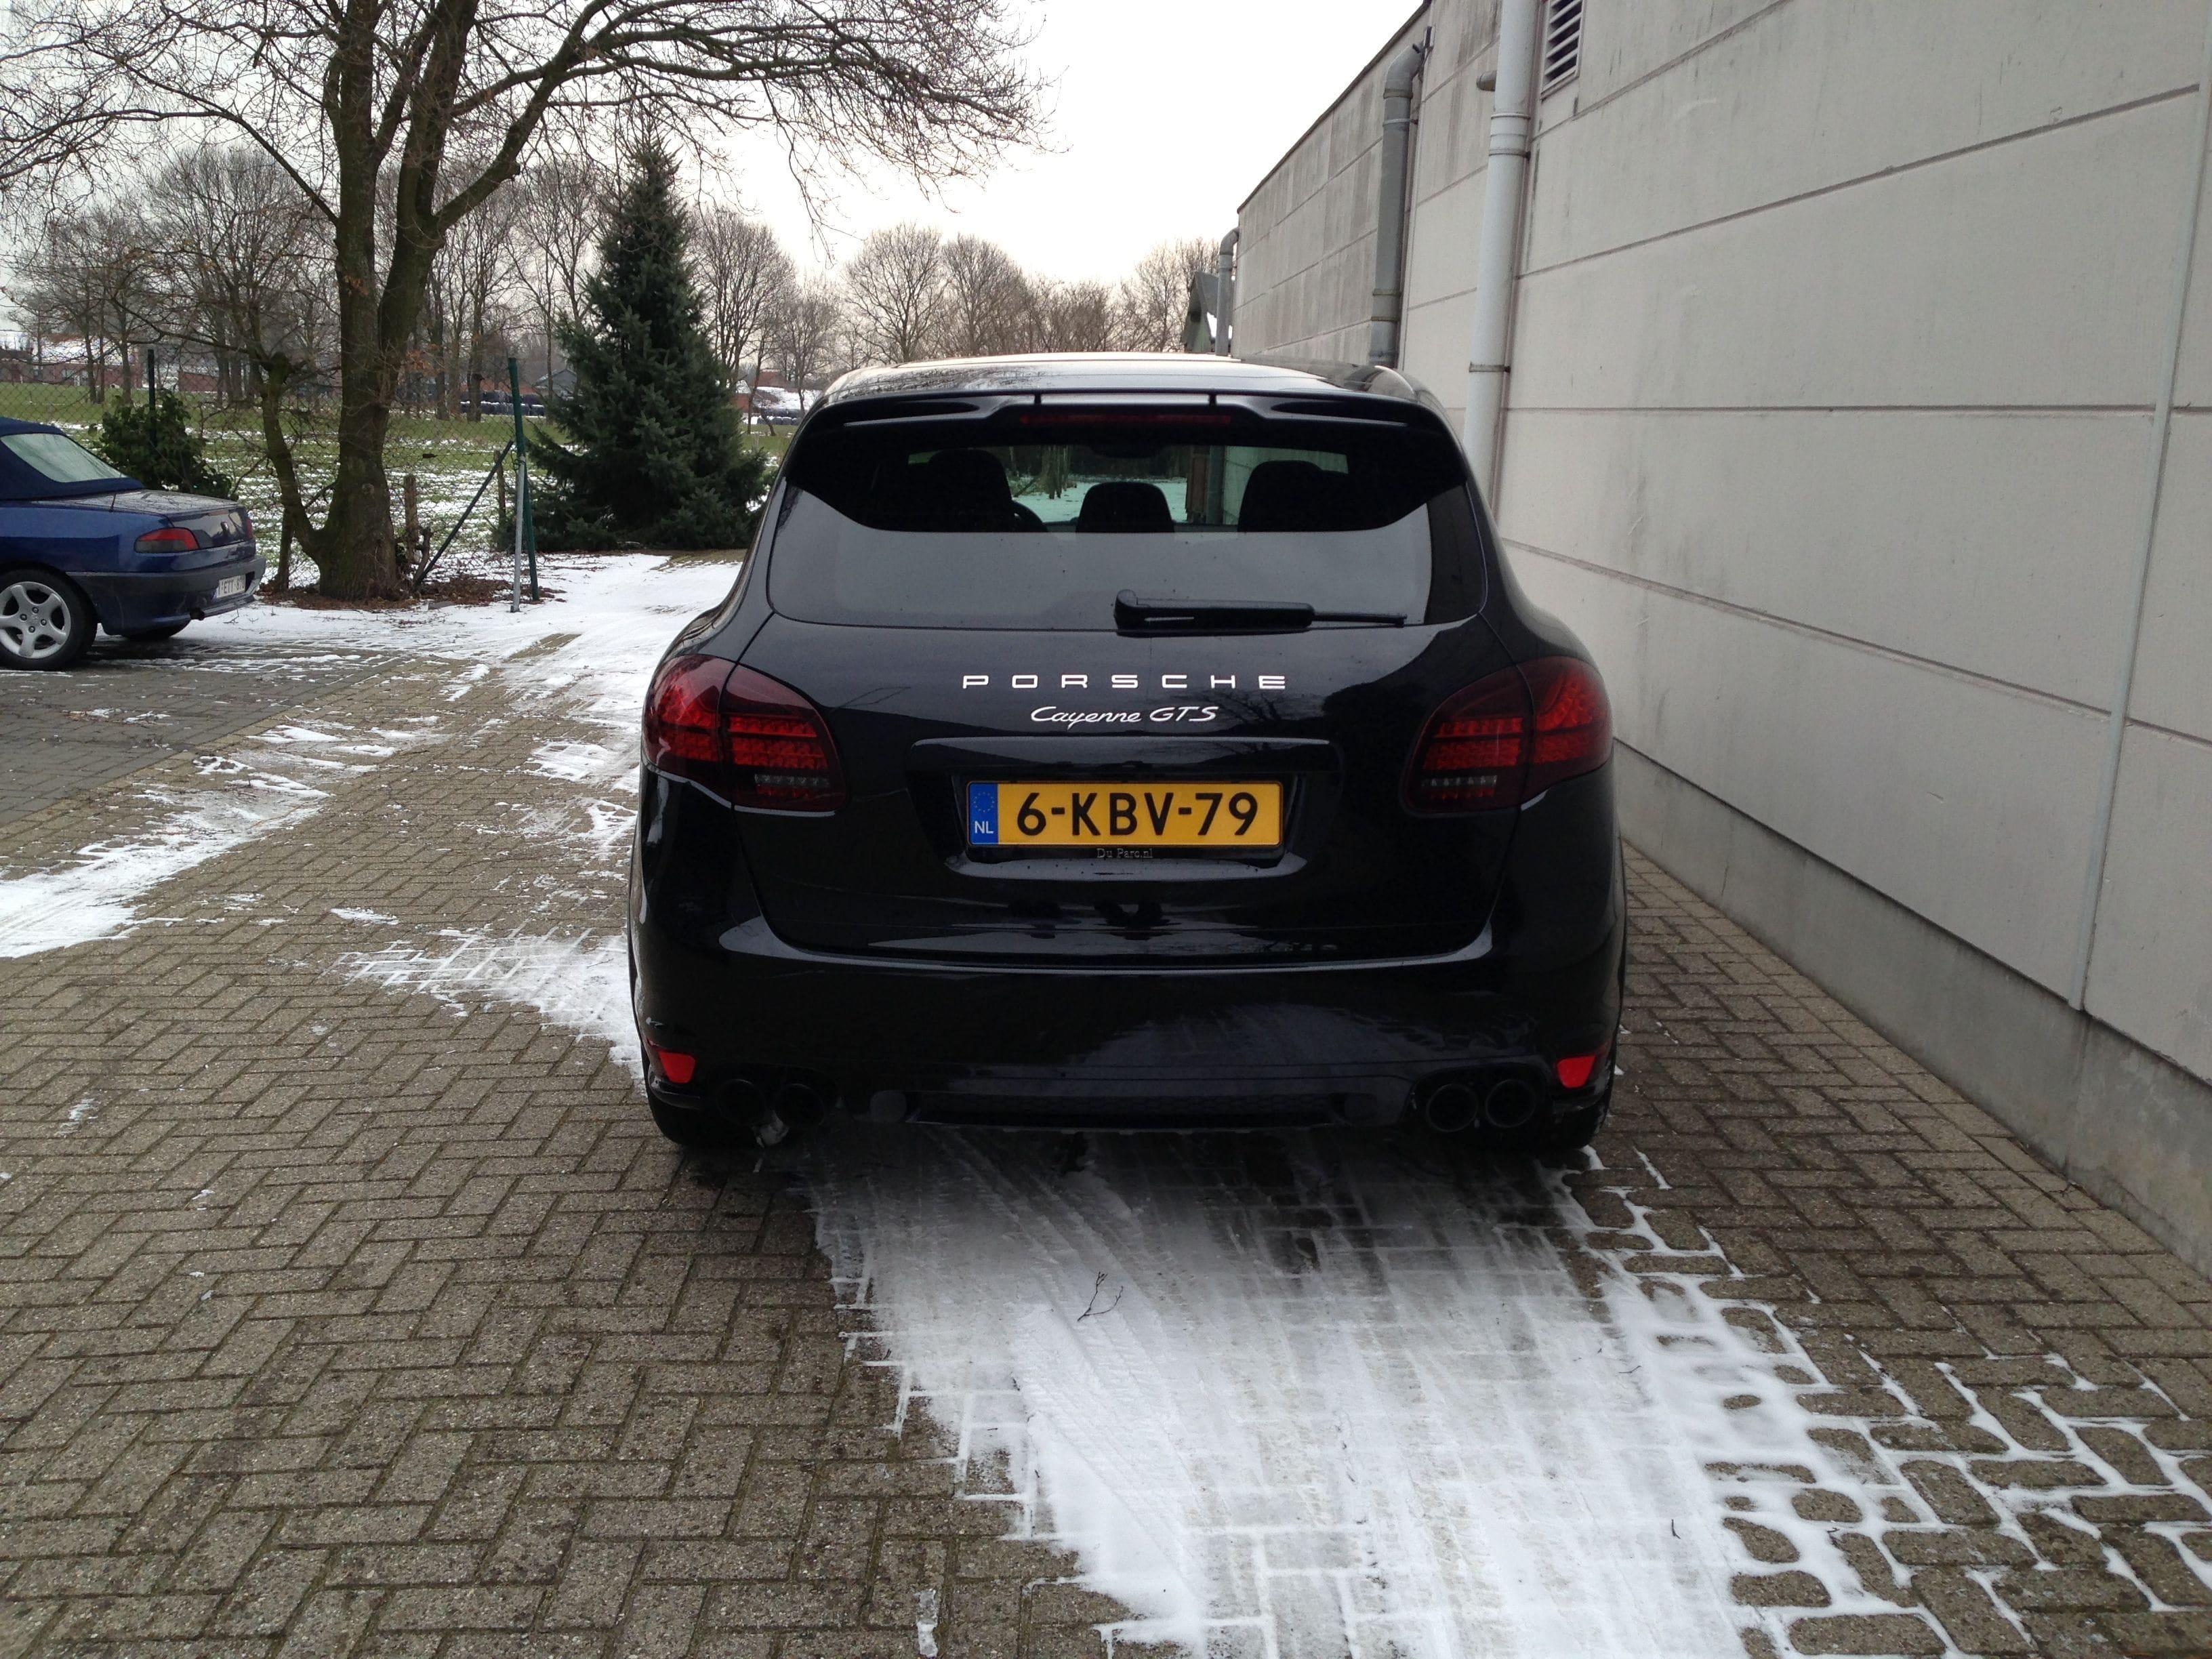 Porsche Cayenne GTS met Gunpowder Wrap, Carwrapping door Wrapmyride.nu Foto-nr:6757, ©2021